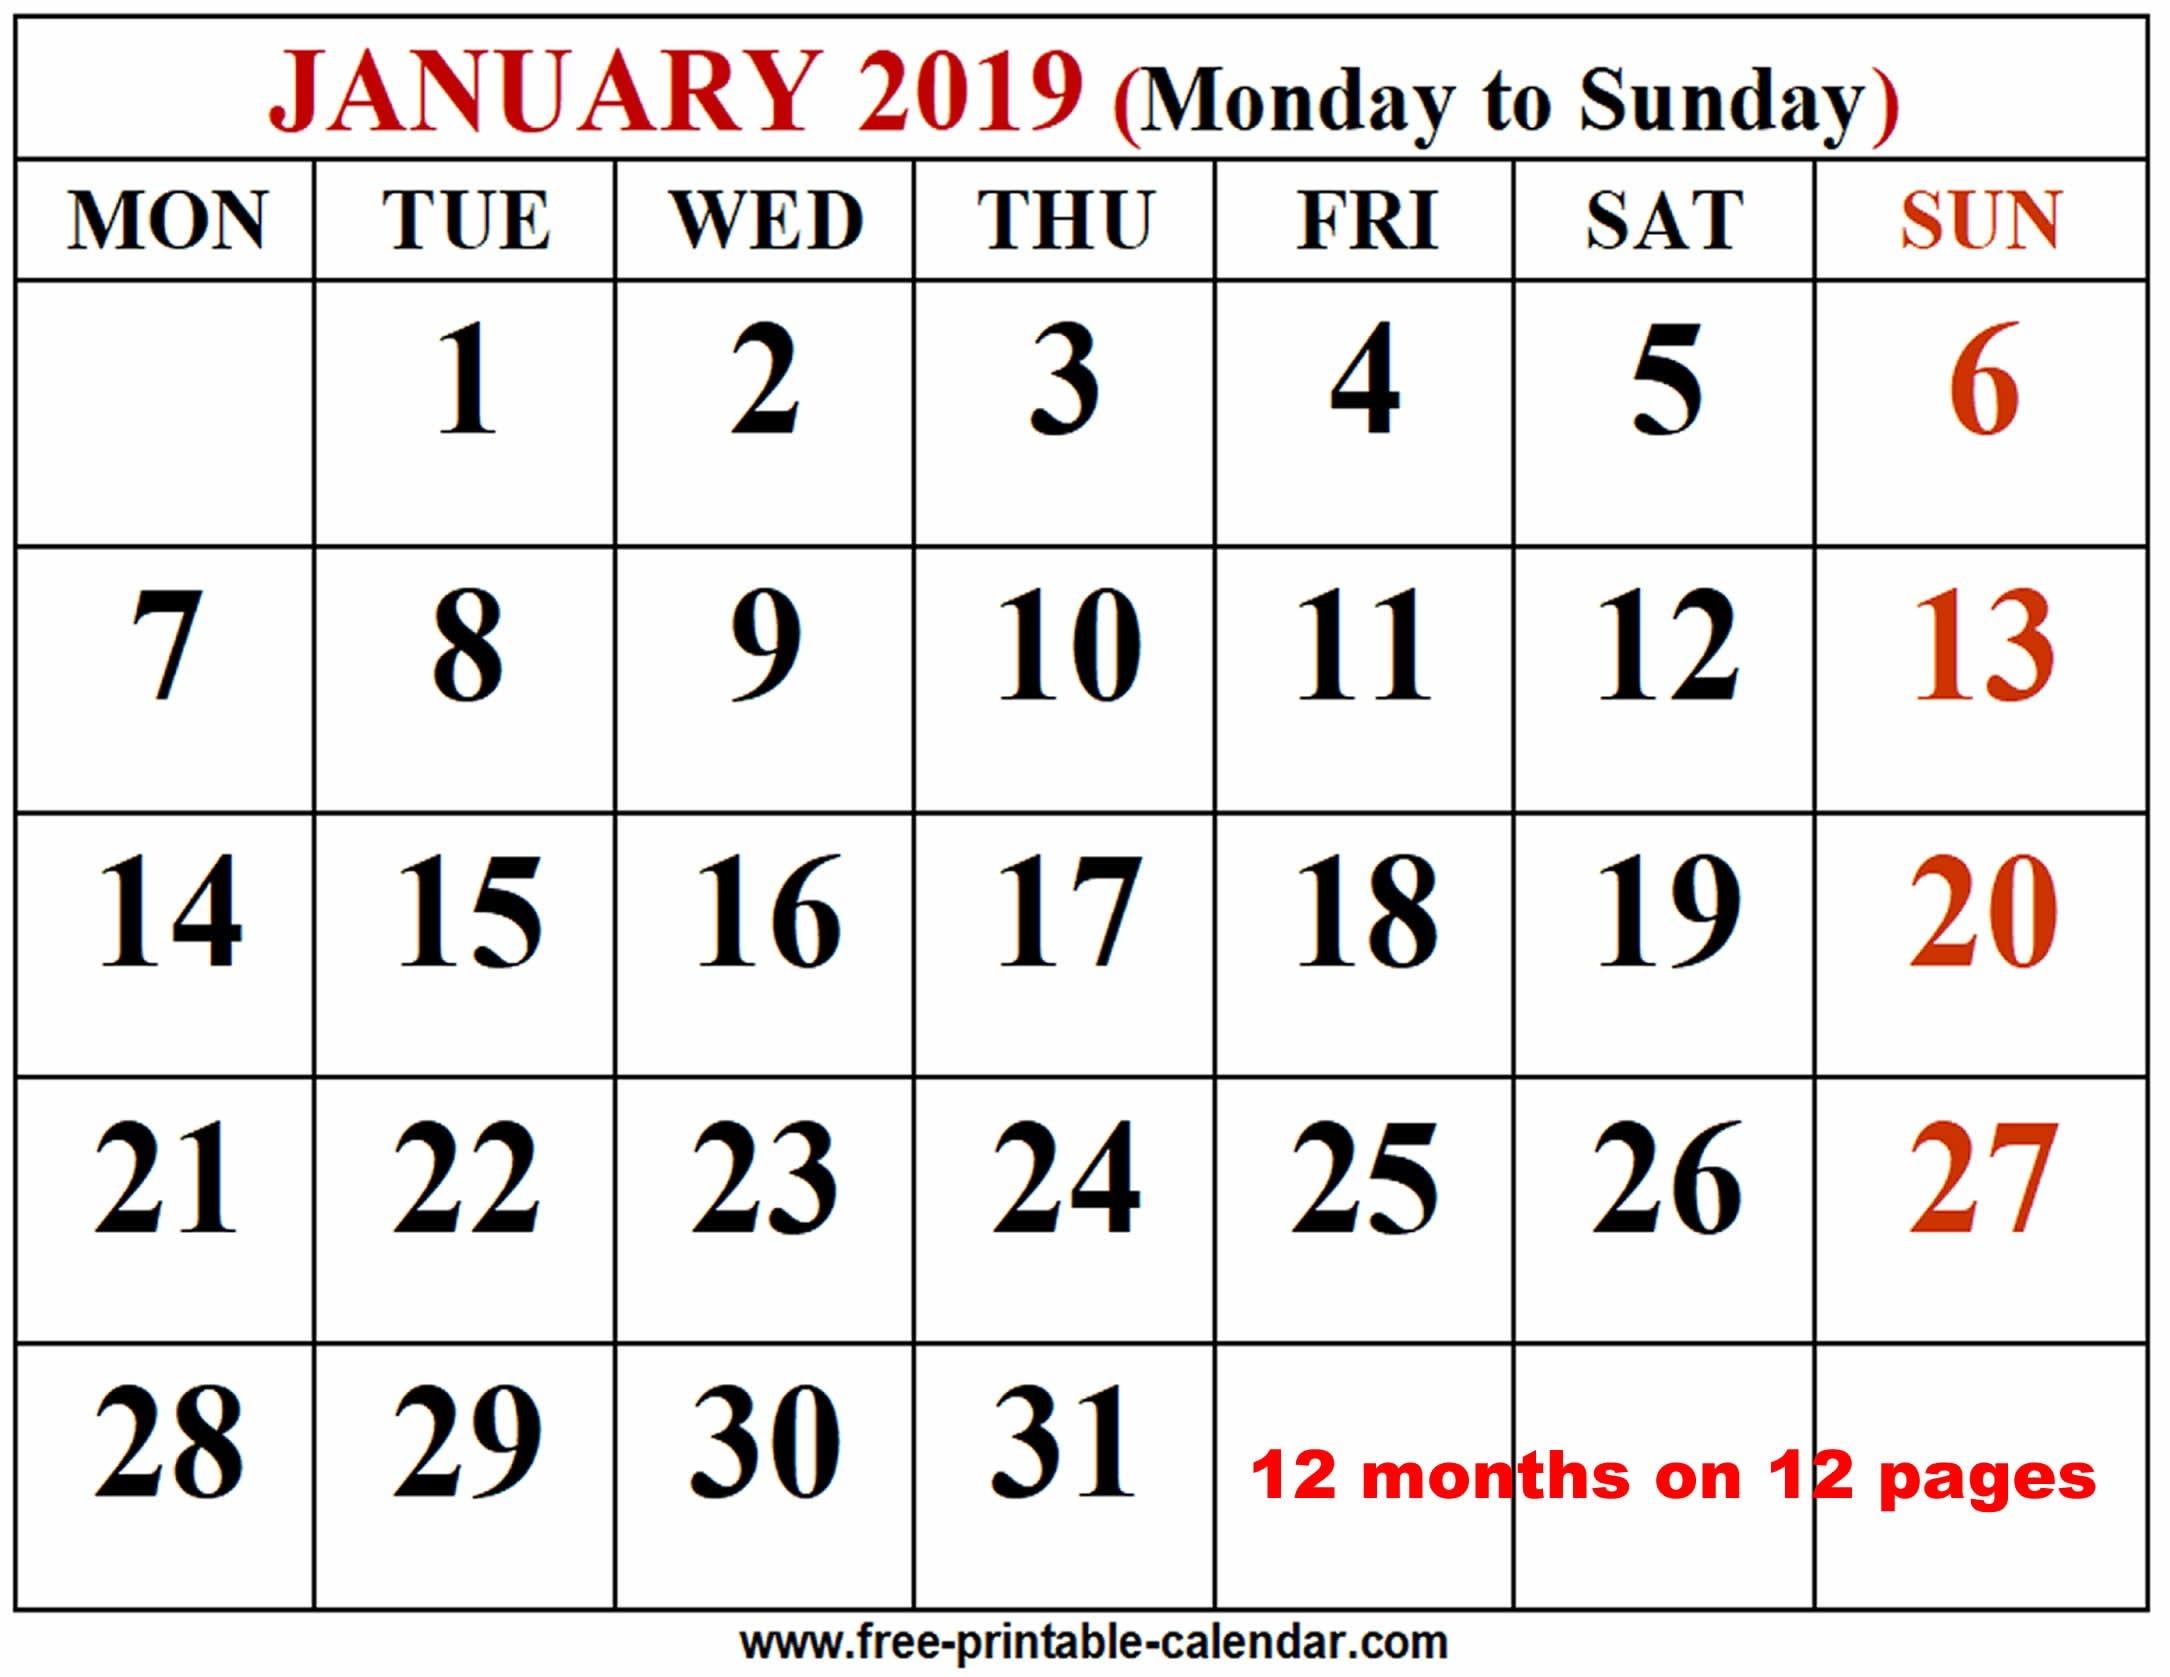 2019 Calendar Template - Free-Printable-Calendar  3 Month Calendar Free Print